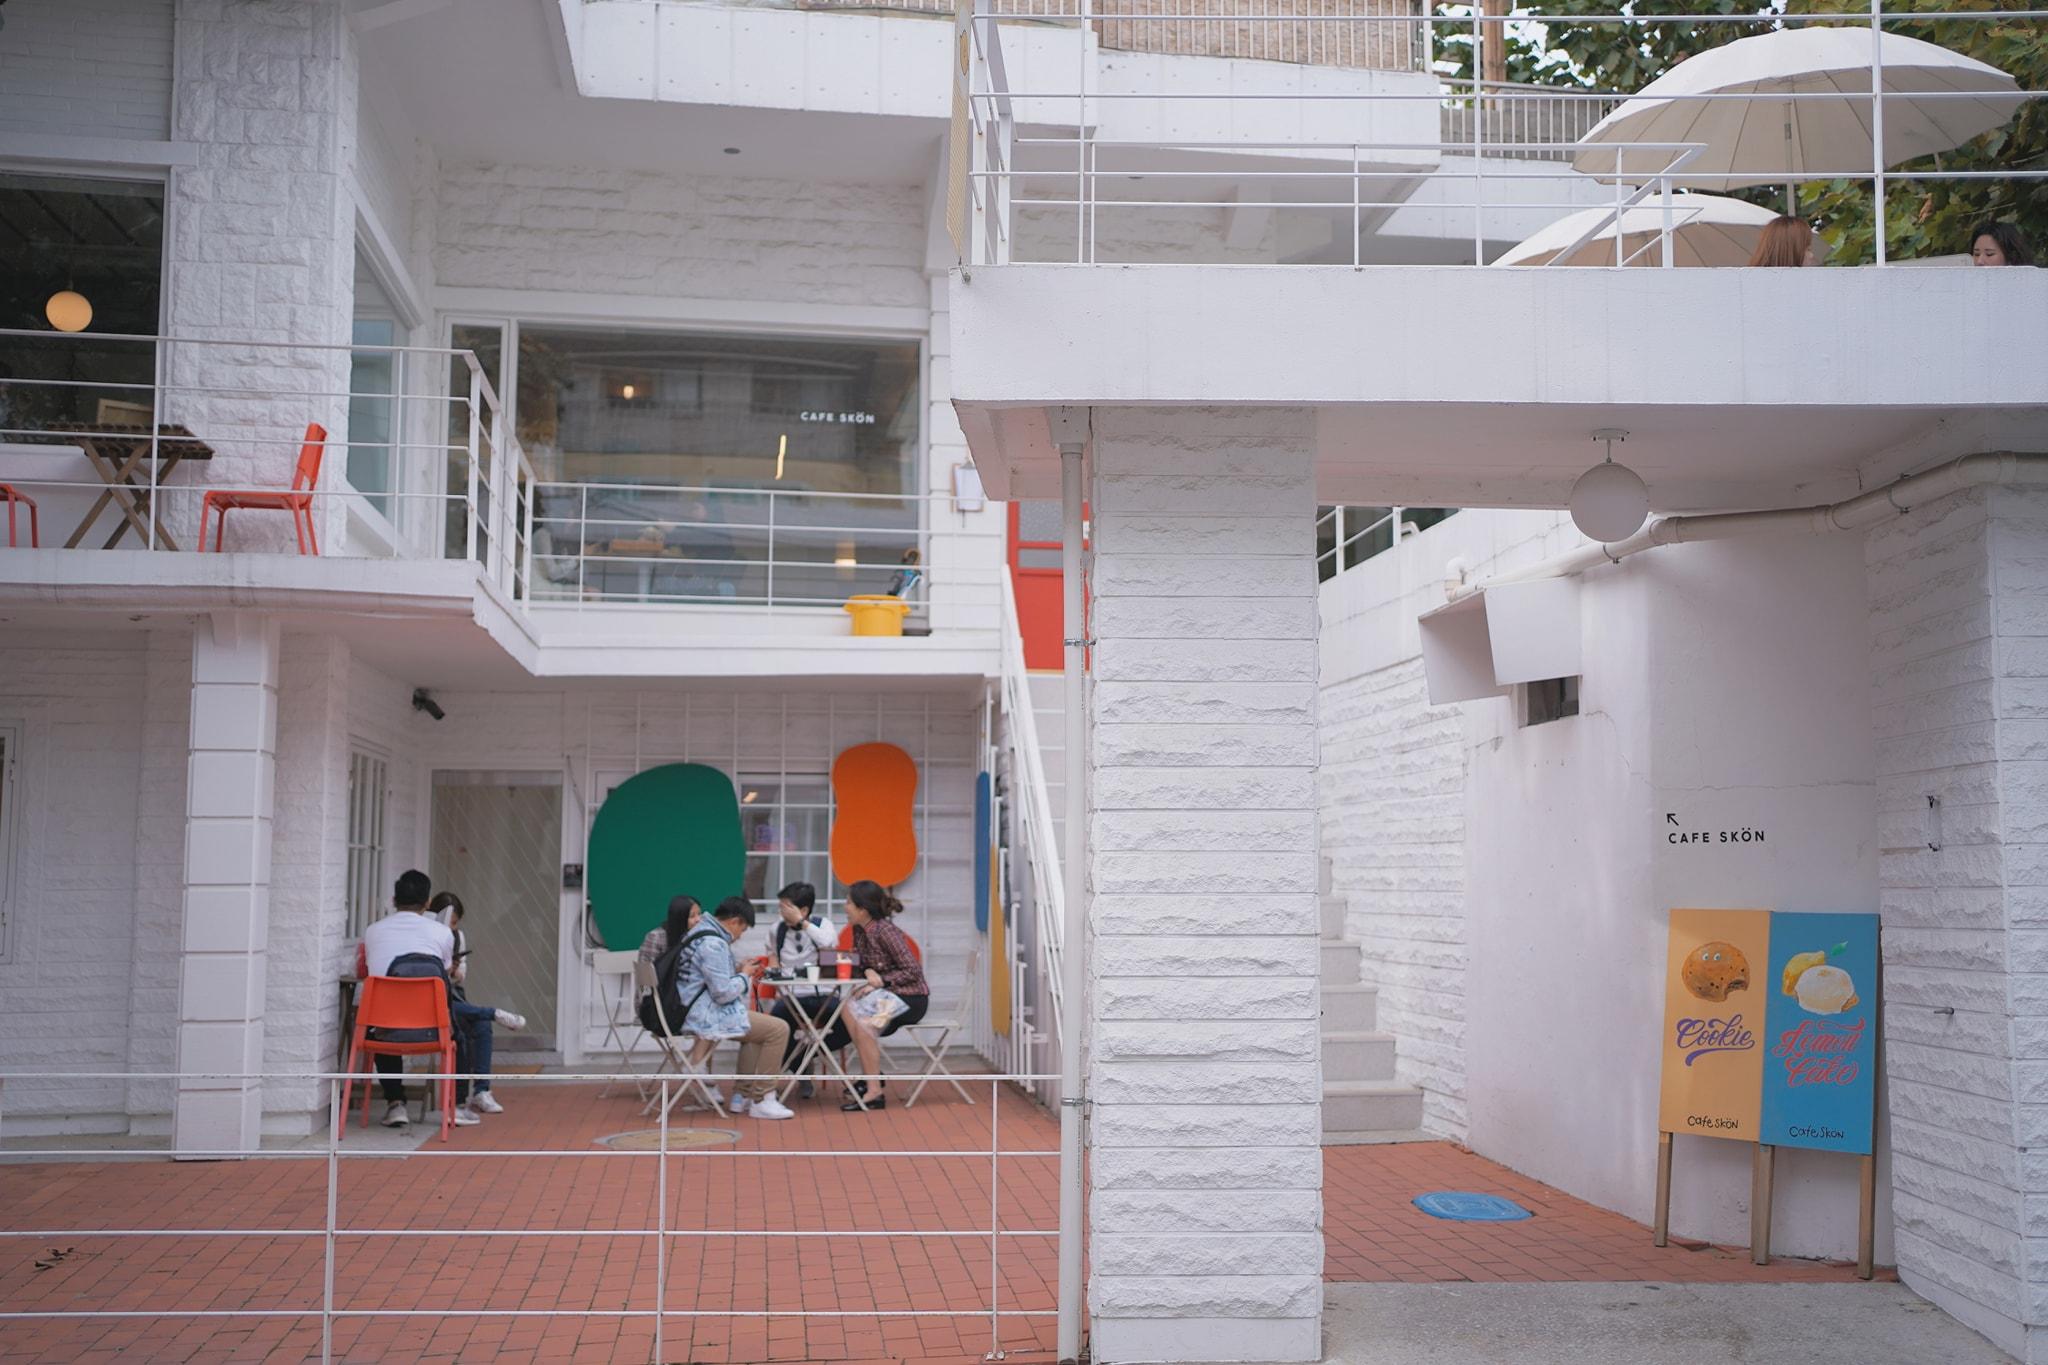 aesthetic cafes seoul cafe skon